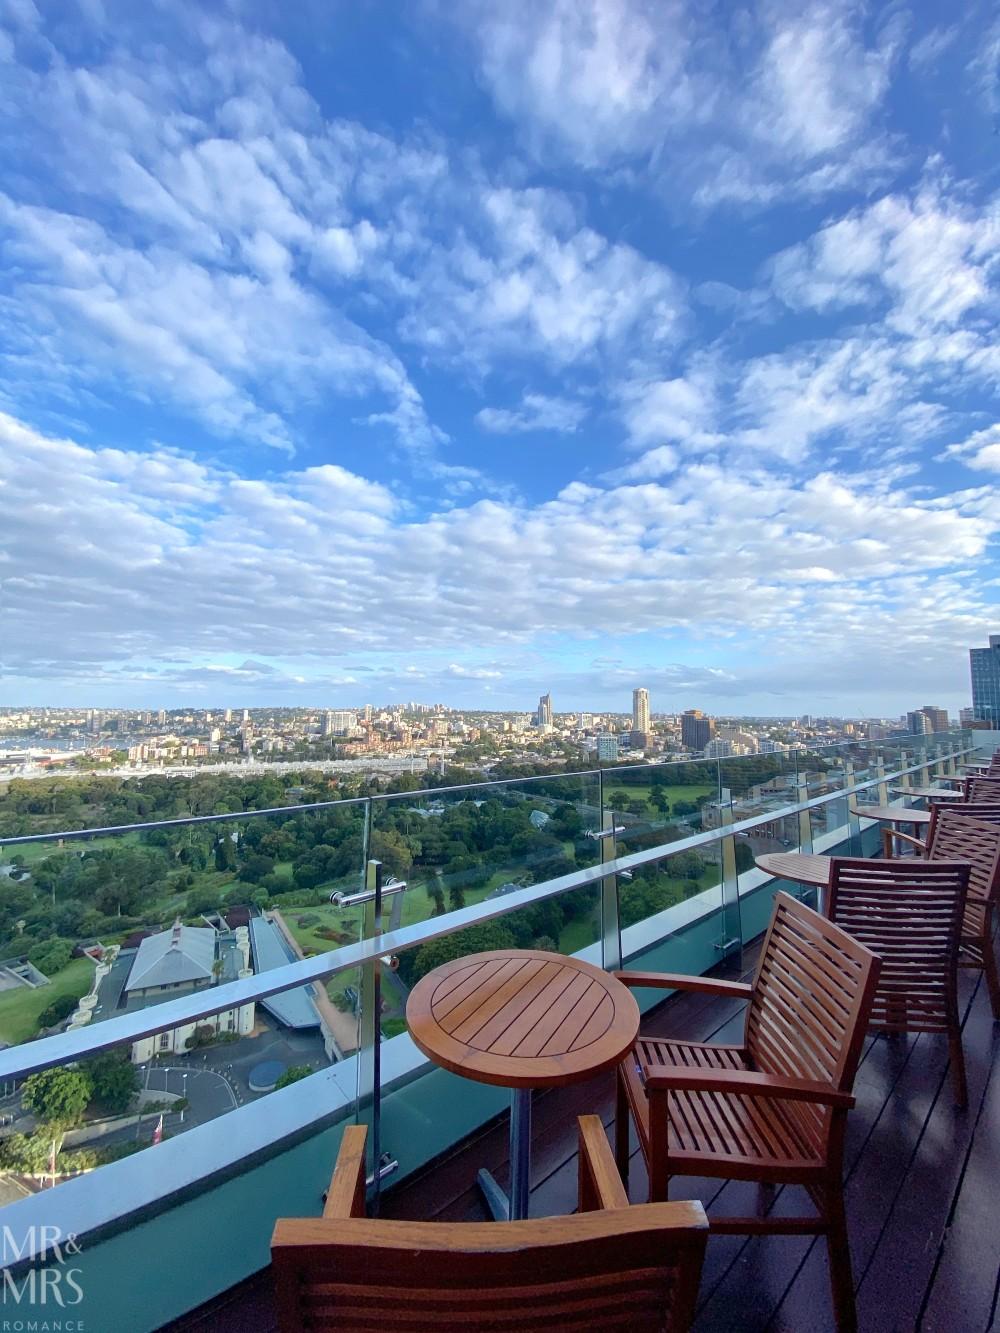 Panorama Lounge Bar InterContinental Hotel Sydney - seating on balcony